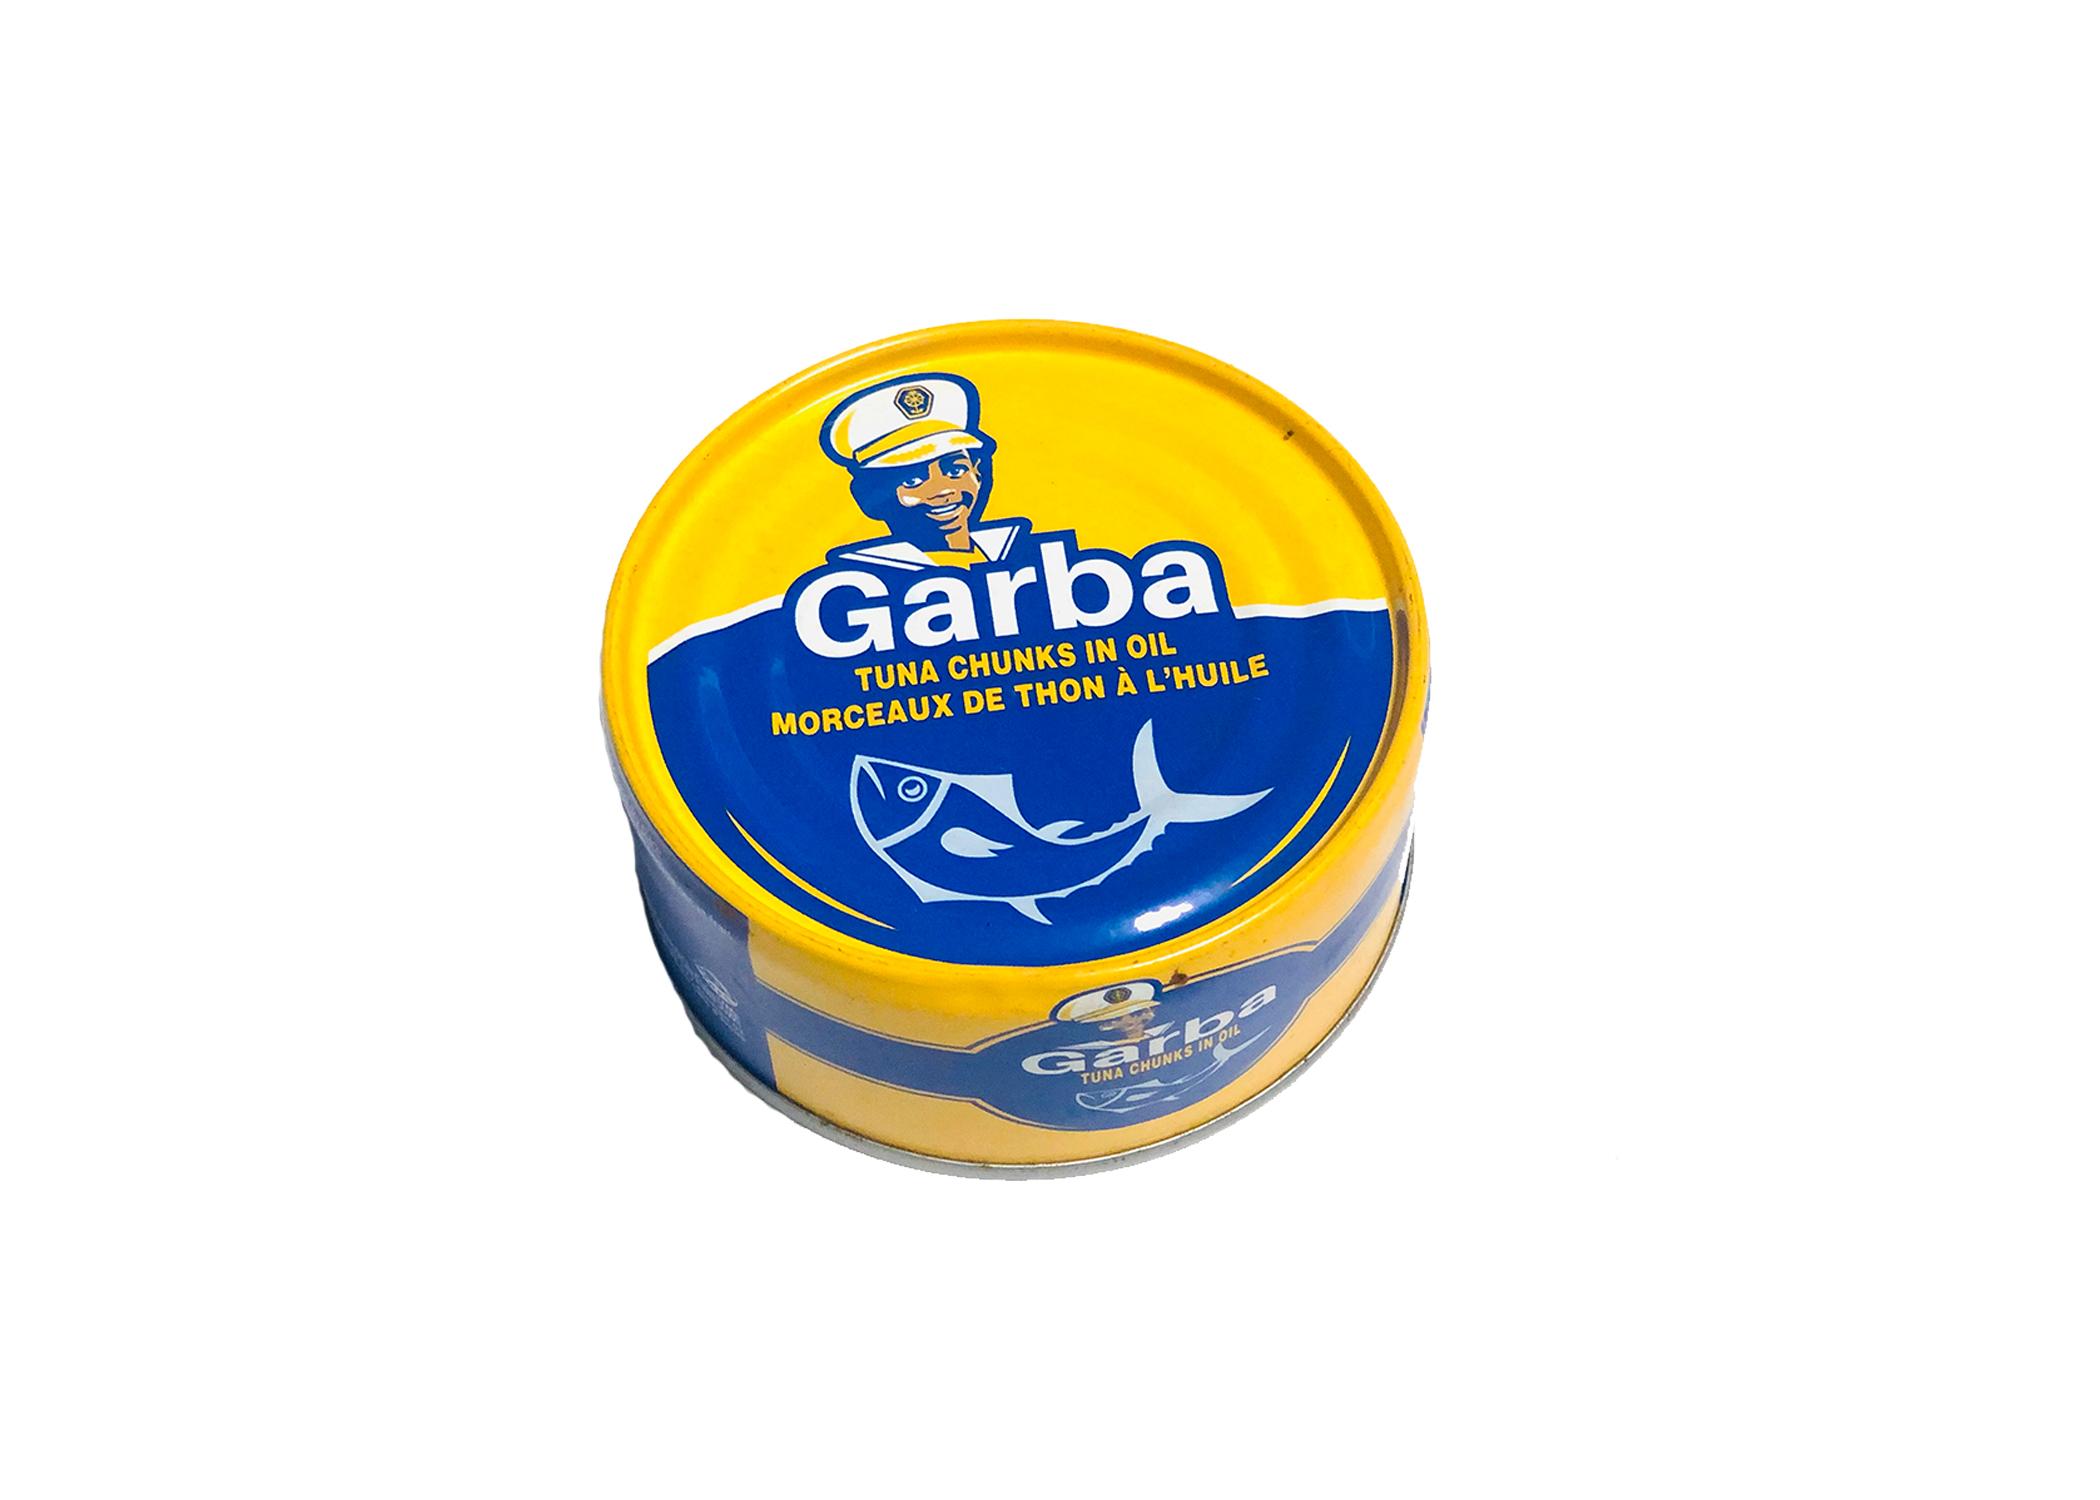 Gpbr-garba-tuna-in-oil